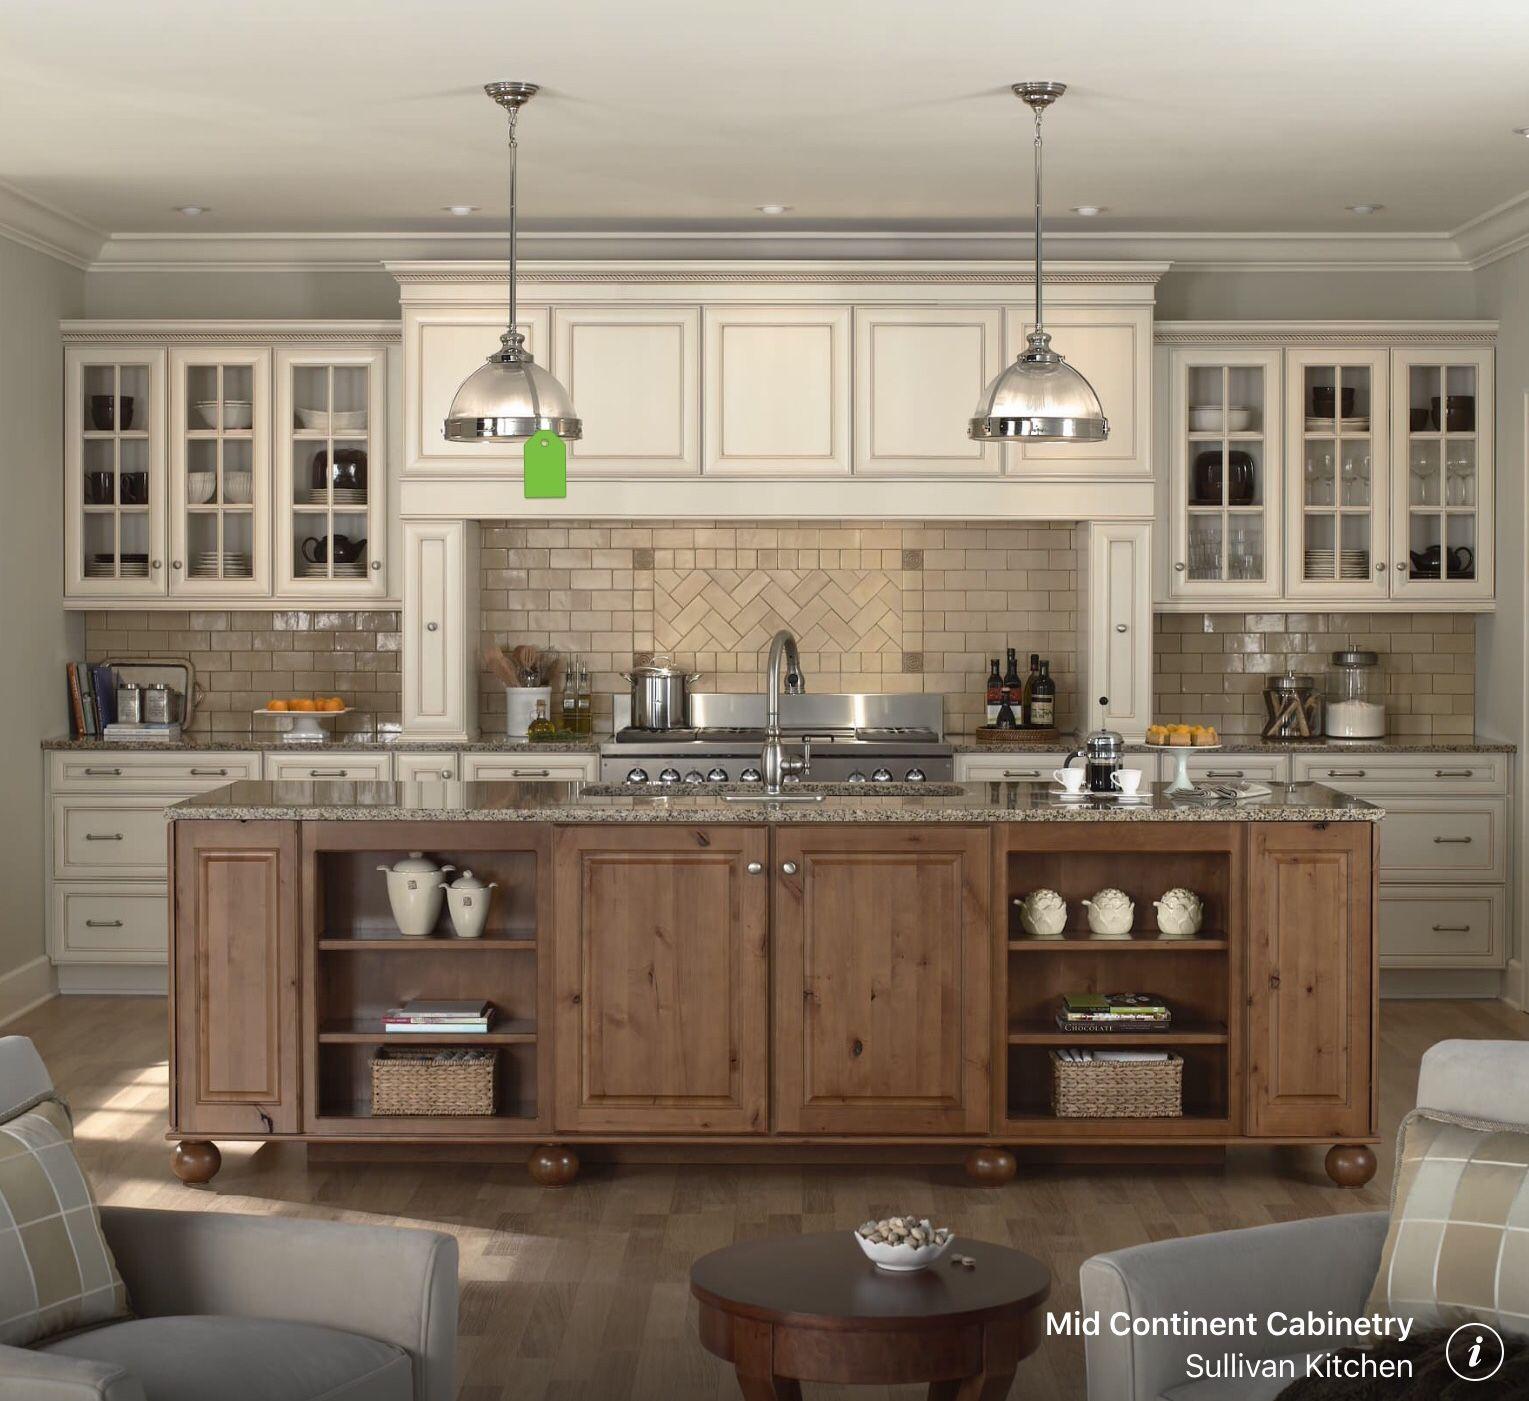 Amanda Byrne Adli Kullanicinin Kitchens Panosundaki Pin Rustik Mutfak Yeni Mutfak Modelleri Klasik Tarz Mutfaklar